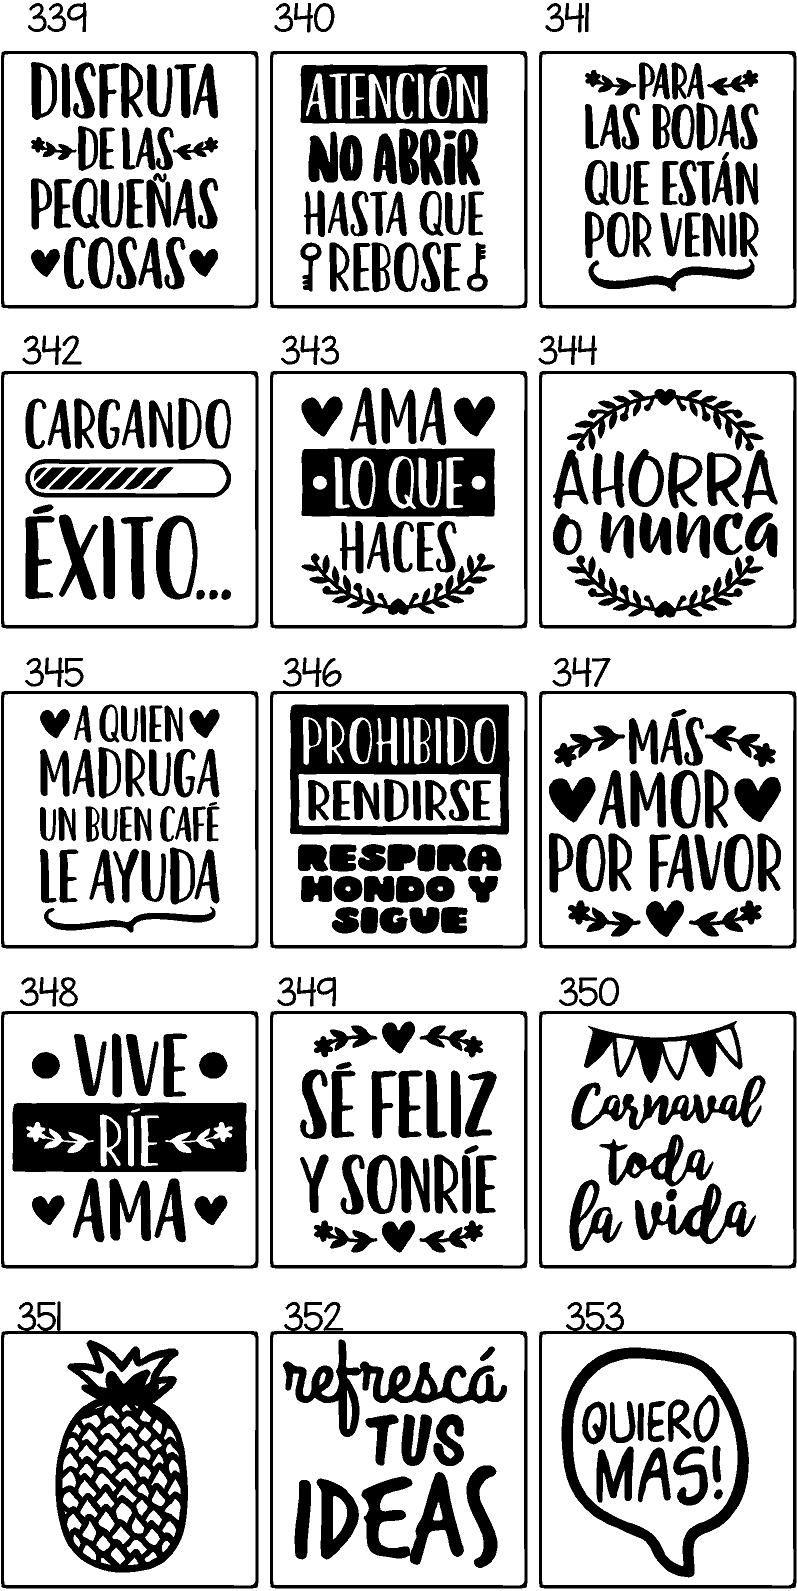 Saving For The Coffee Frases Para Frascos Frases Para